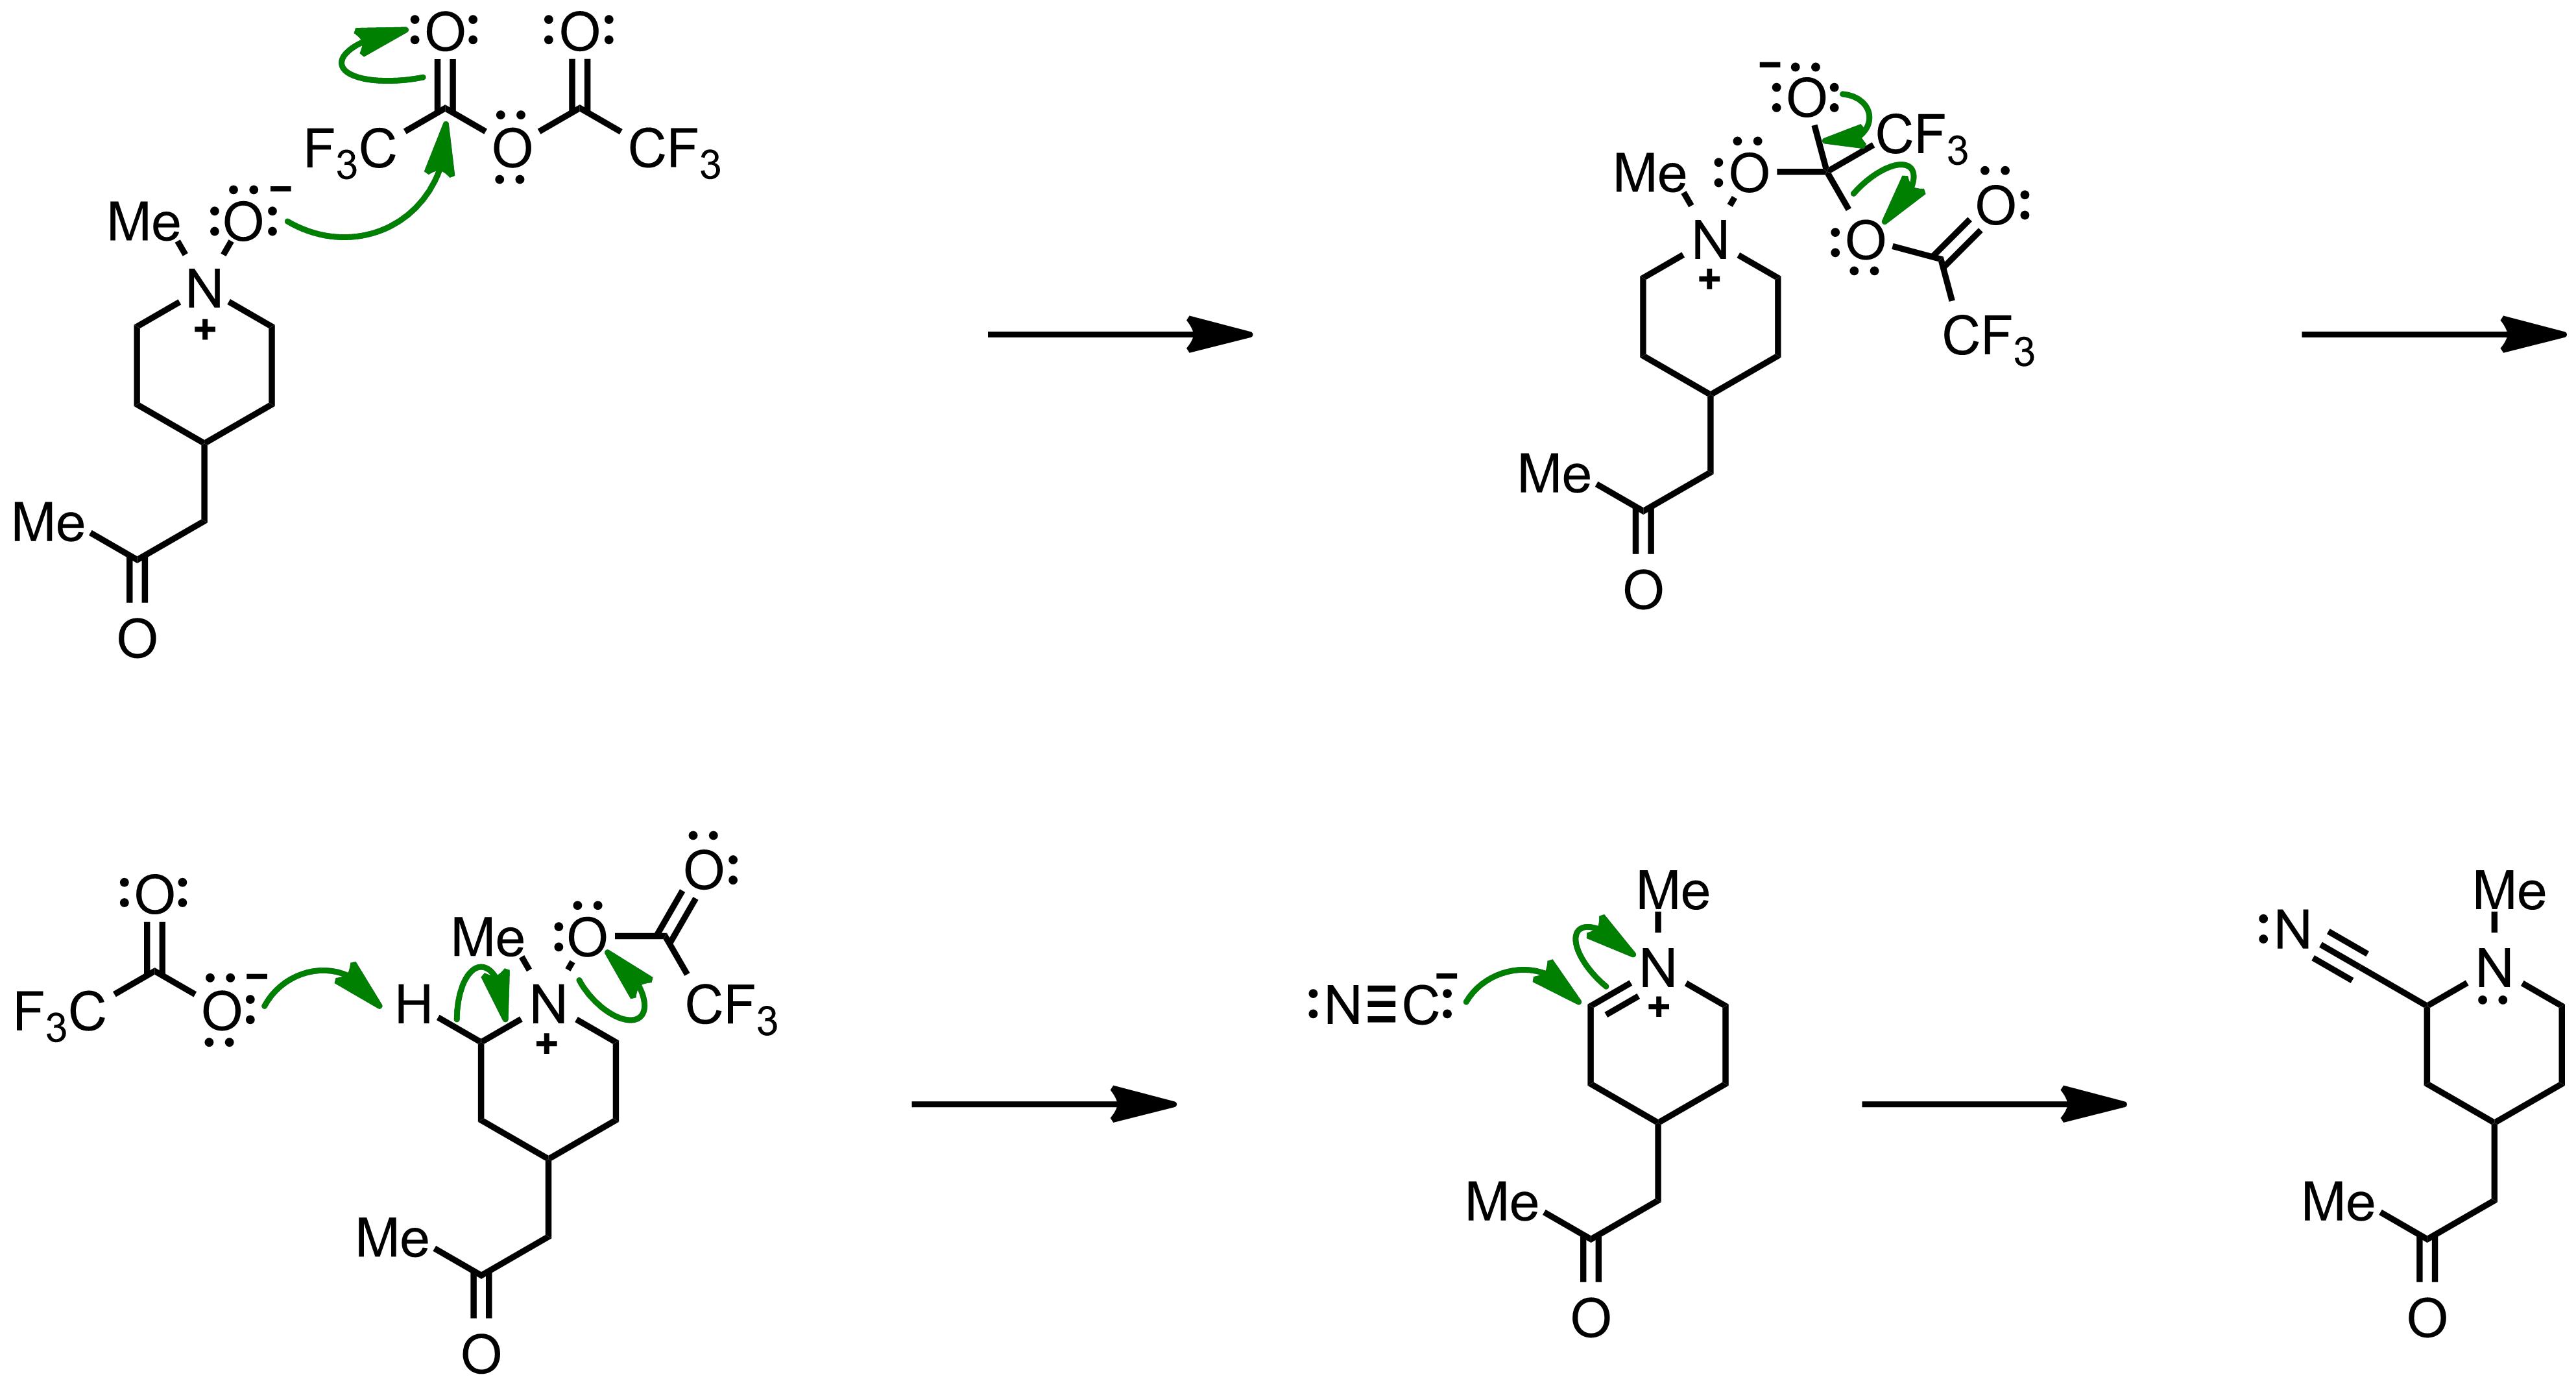 Mechanism of the Polonovski-Potier Reaction